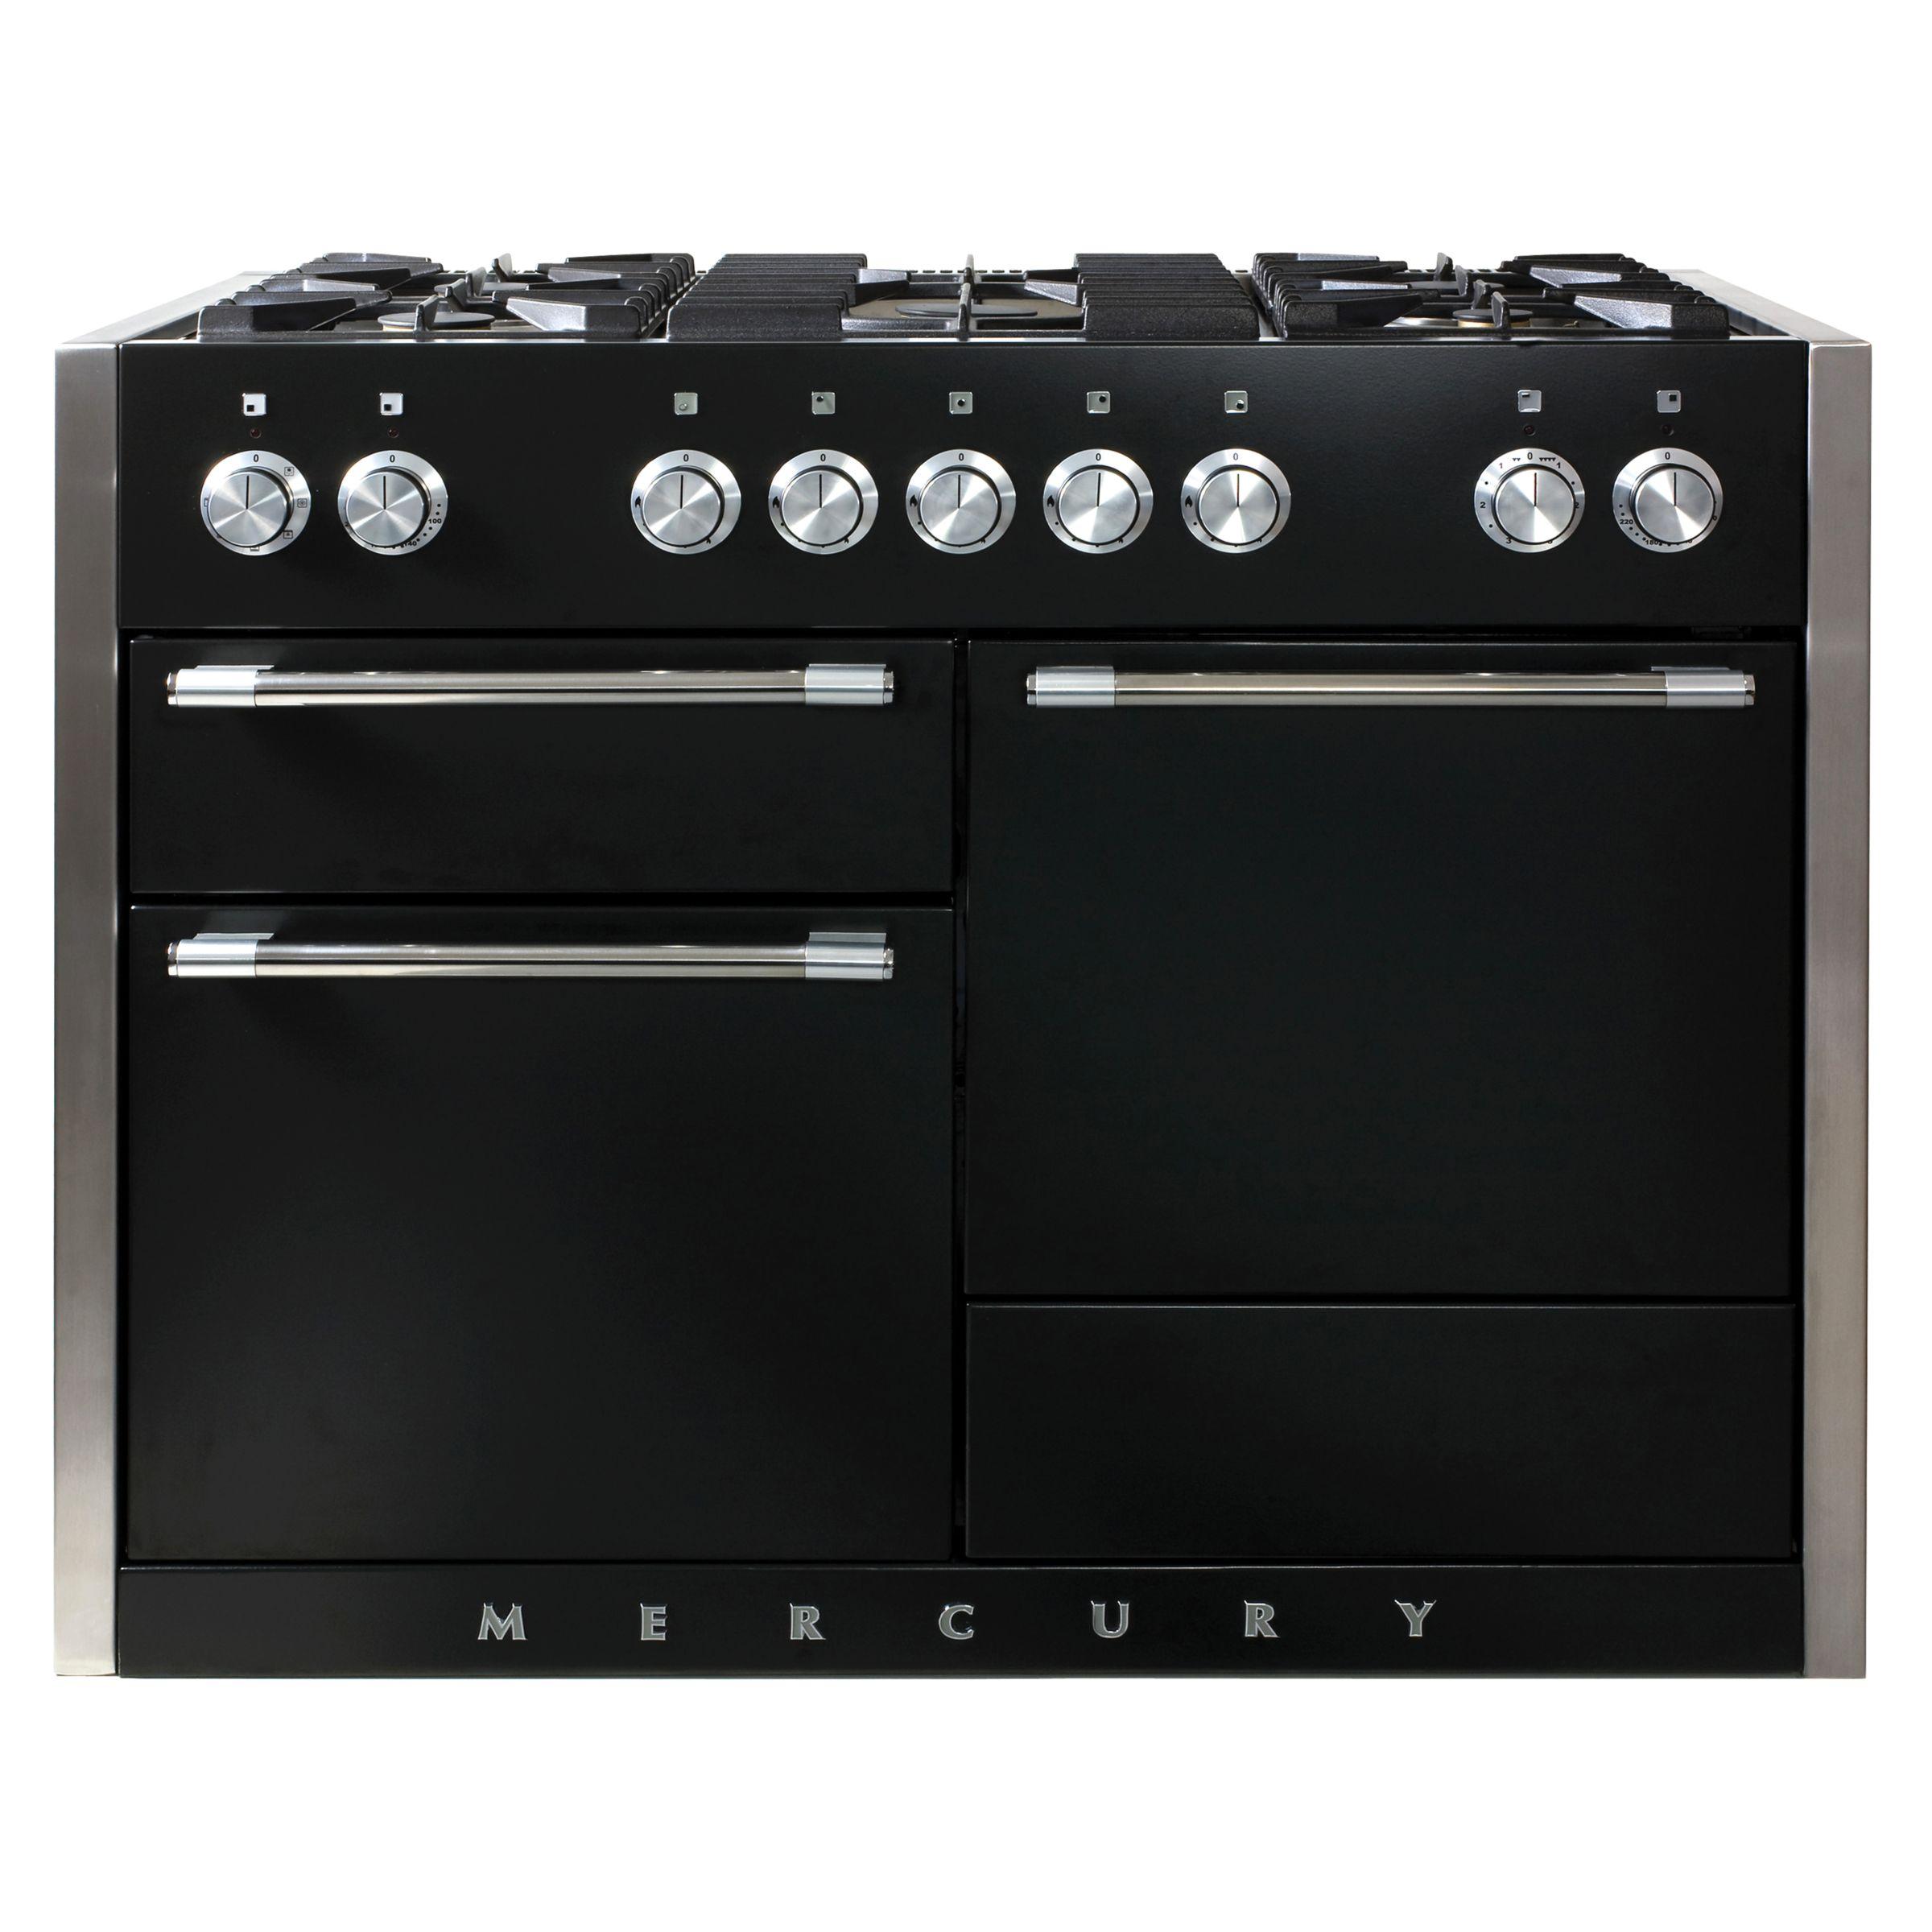 Mercury MCY1200DFLQ Dual Fuel Cooker, Black at John Lewis